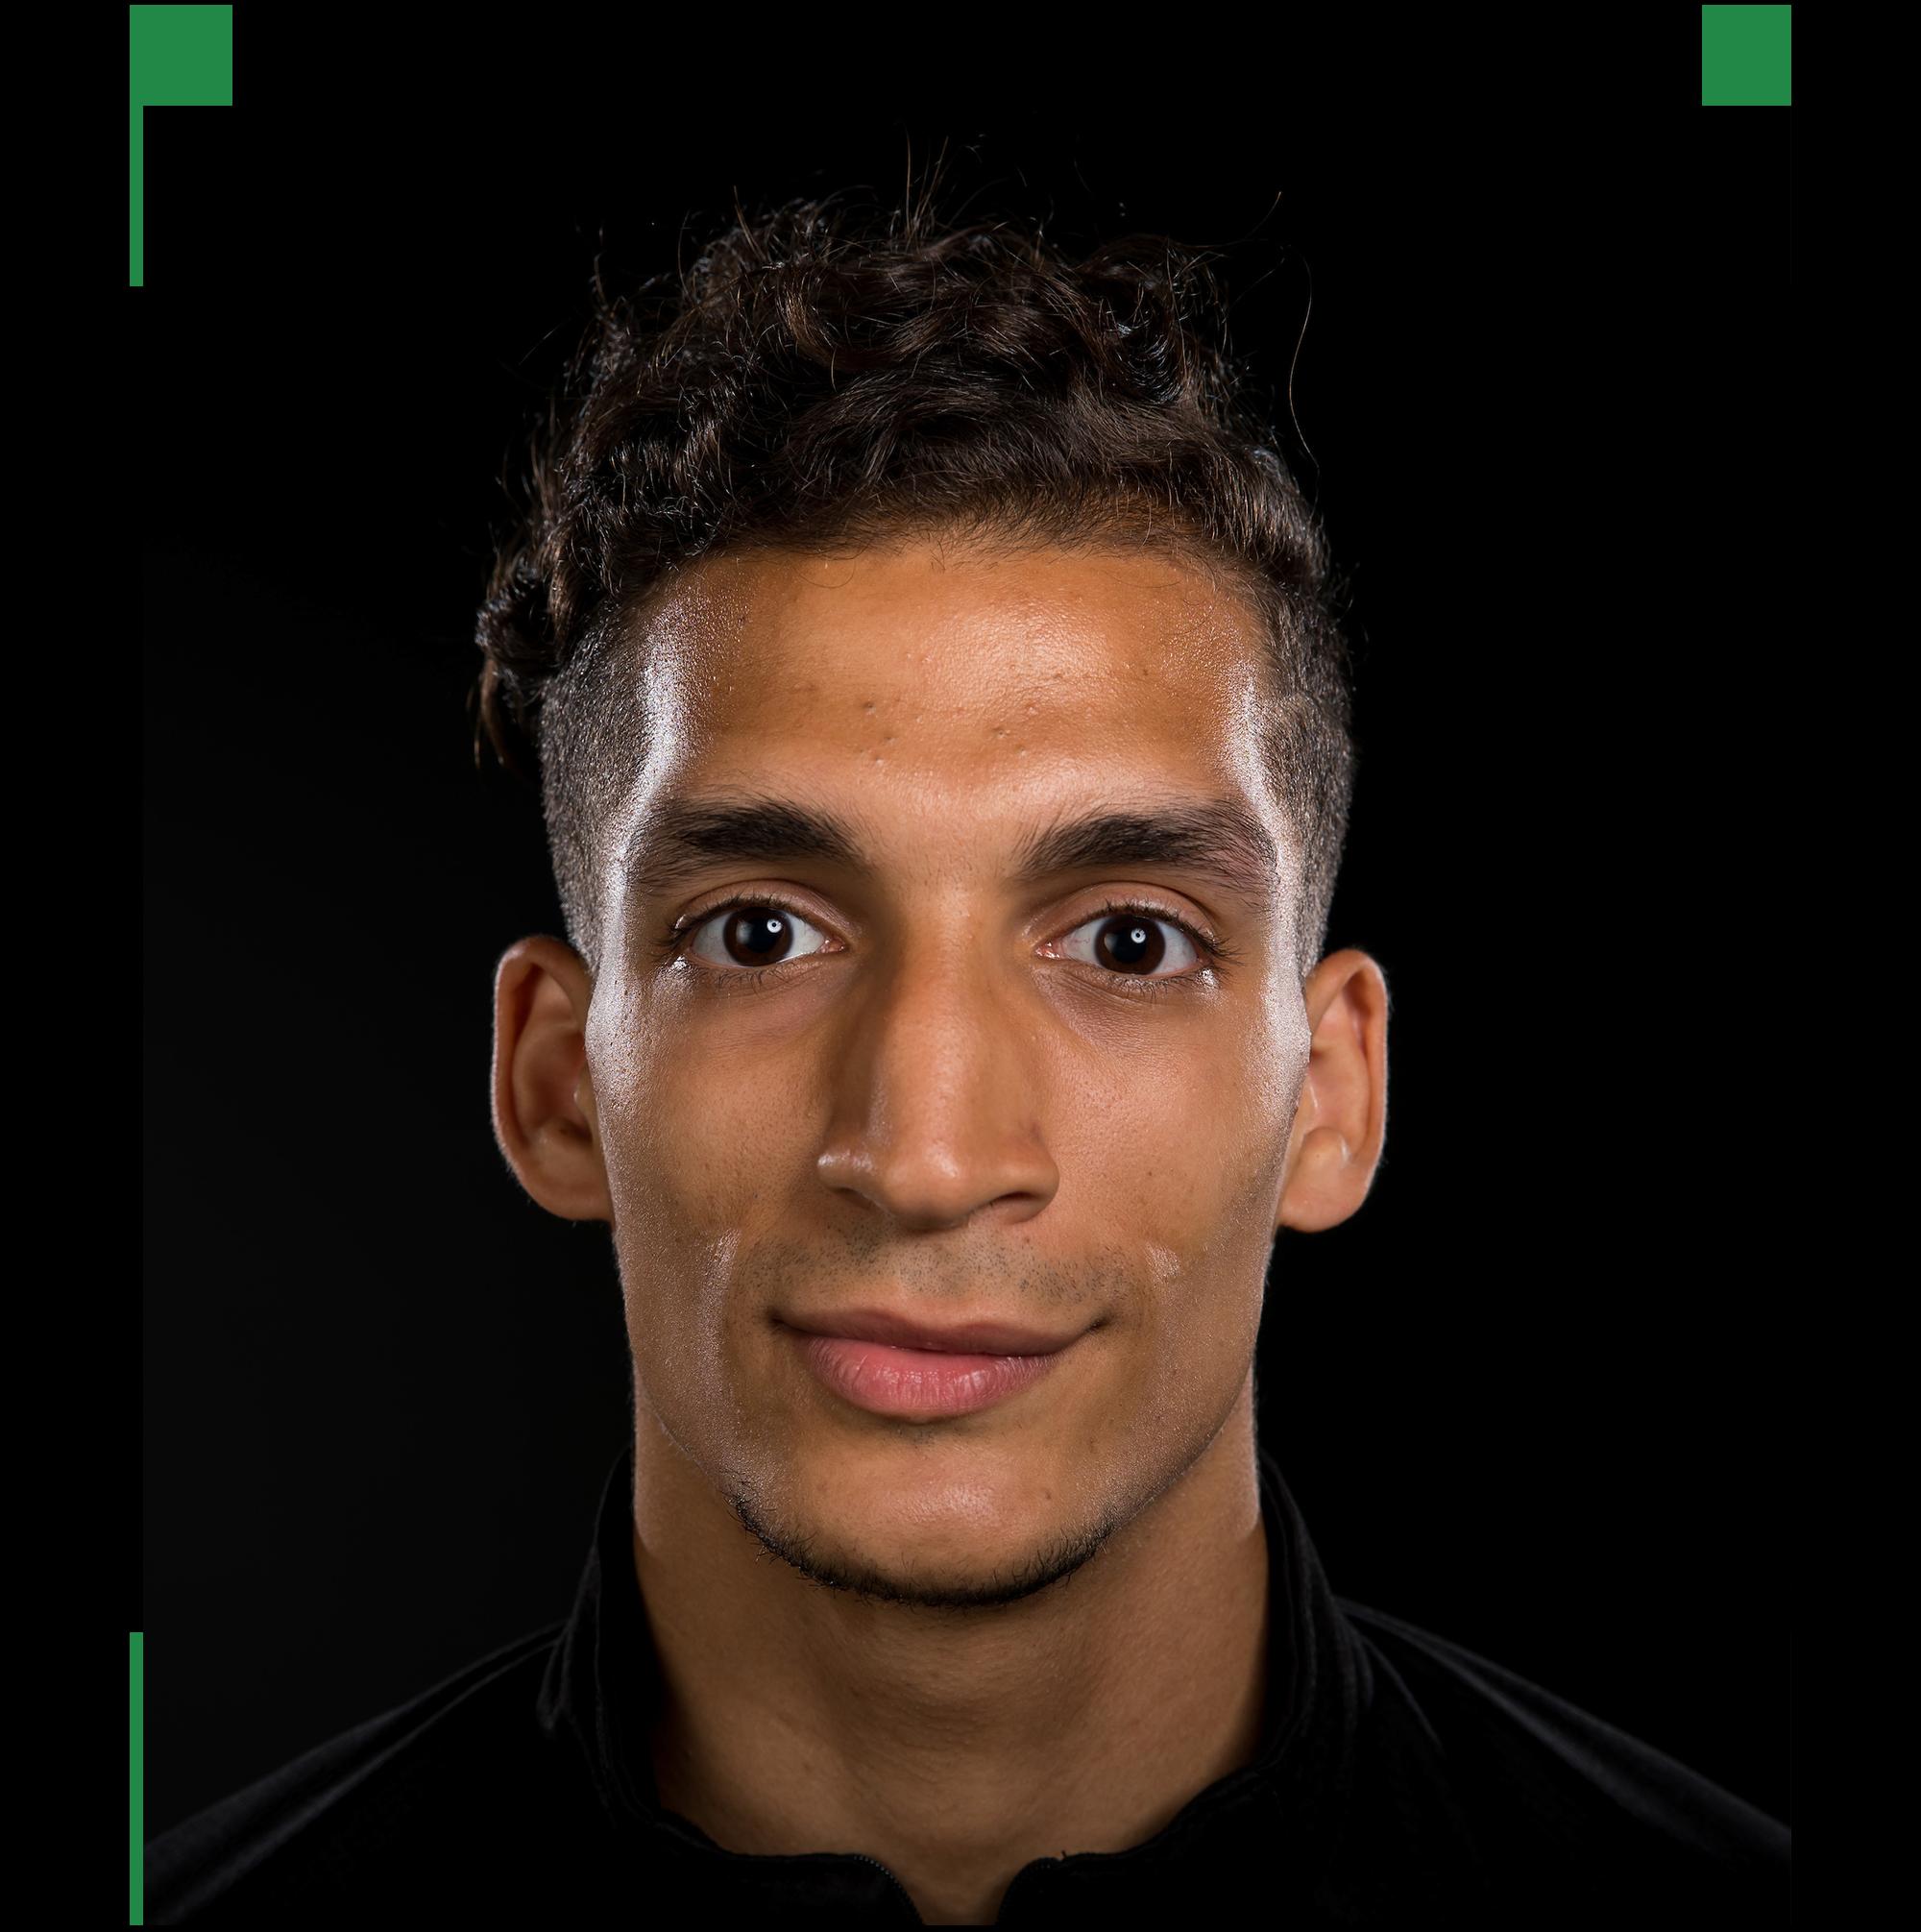 Ahmed Faiad